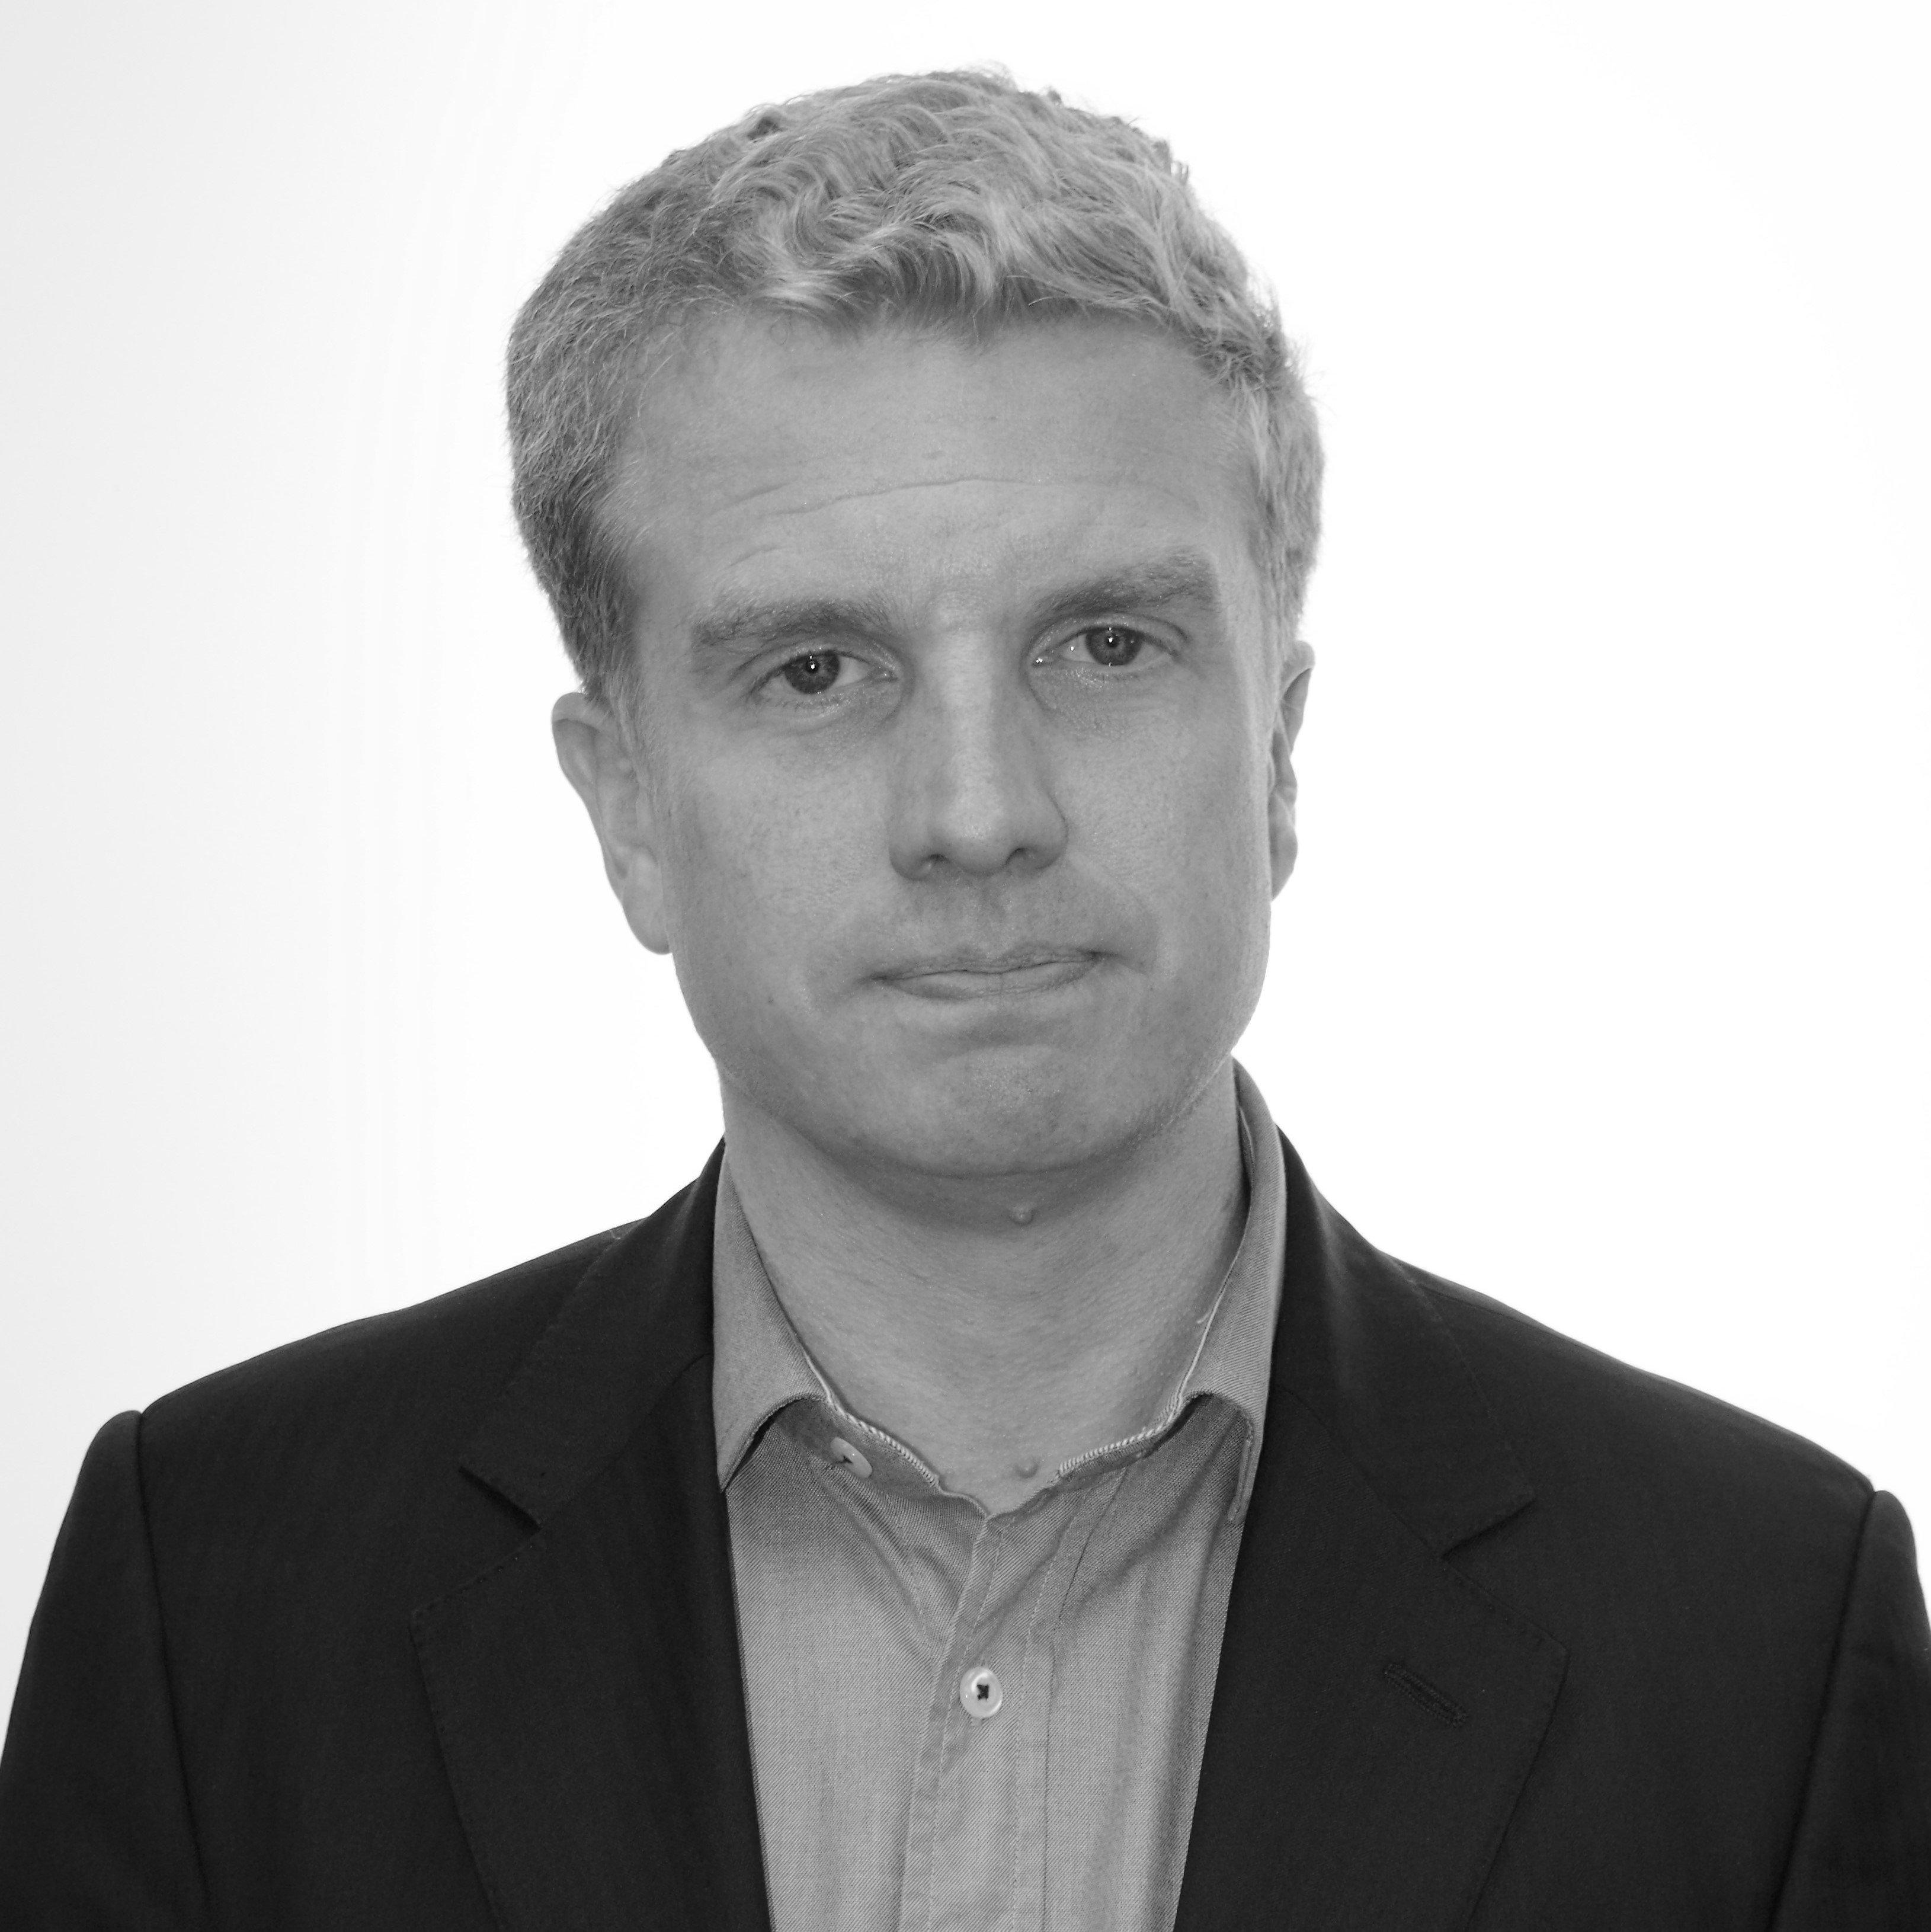 Malcolm PInkerton